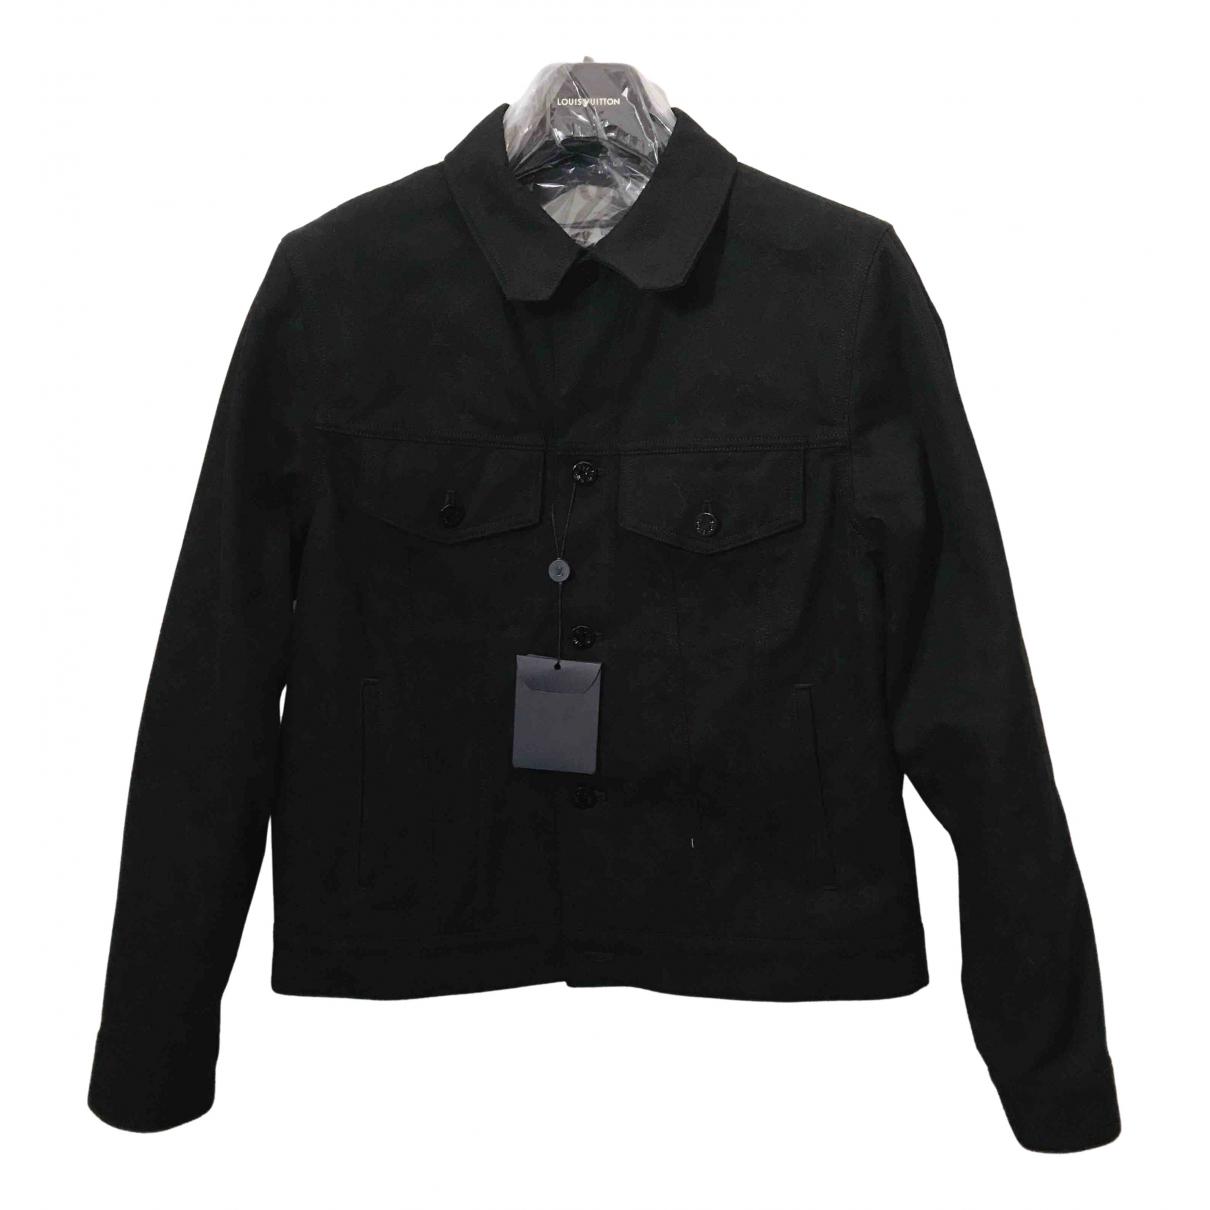 Louis Vuitton N Black Denim - Jeans jacket  for Men 50 FR